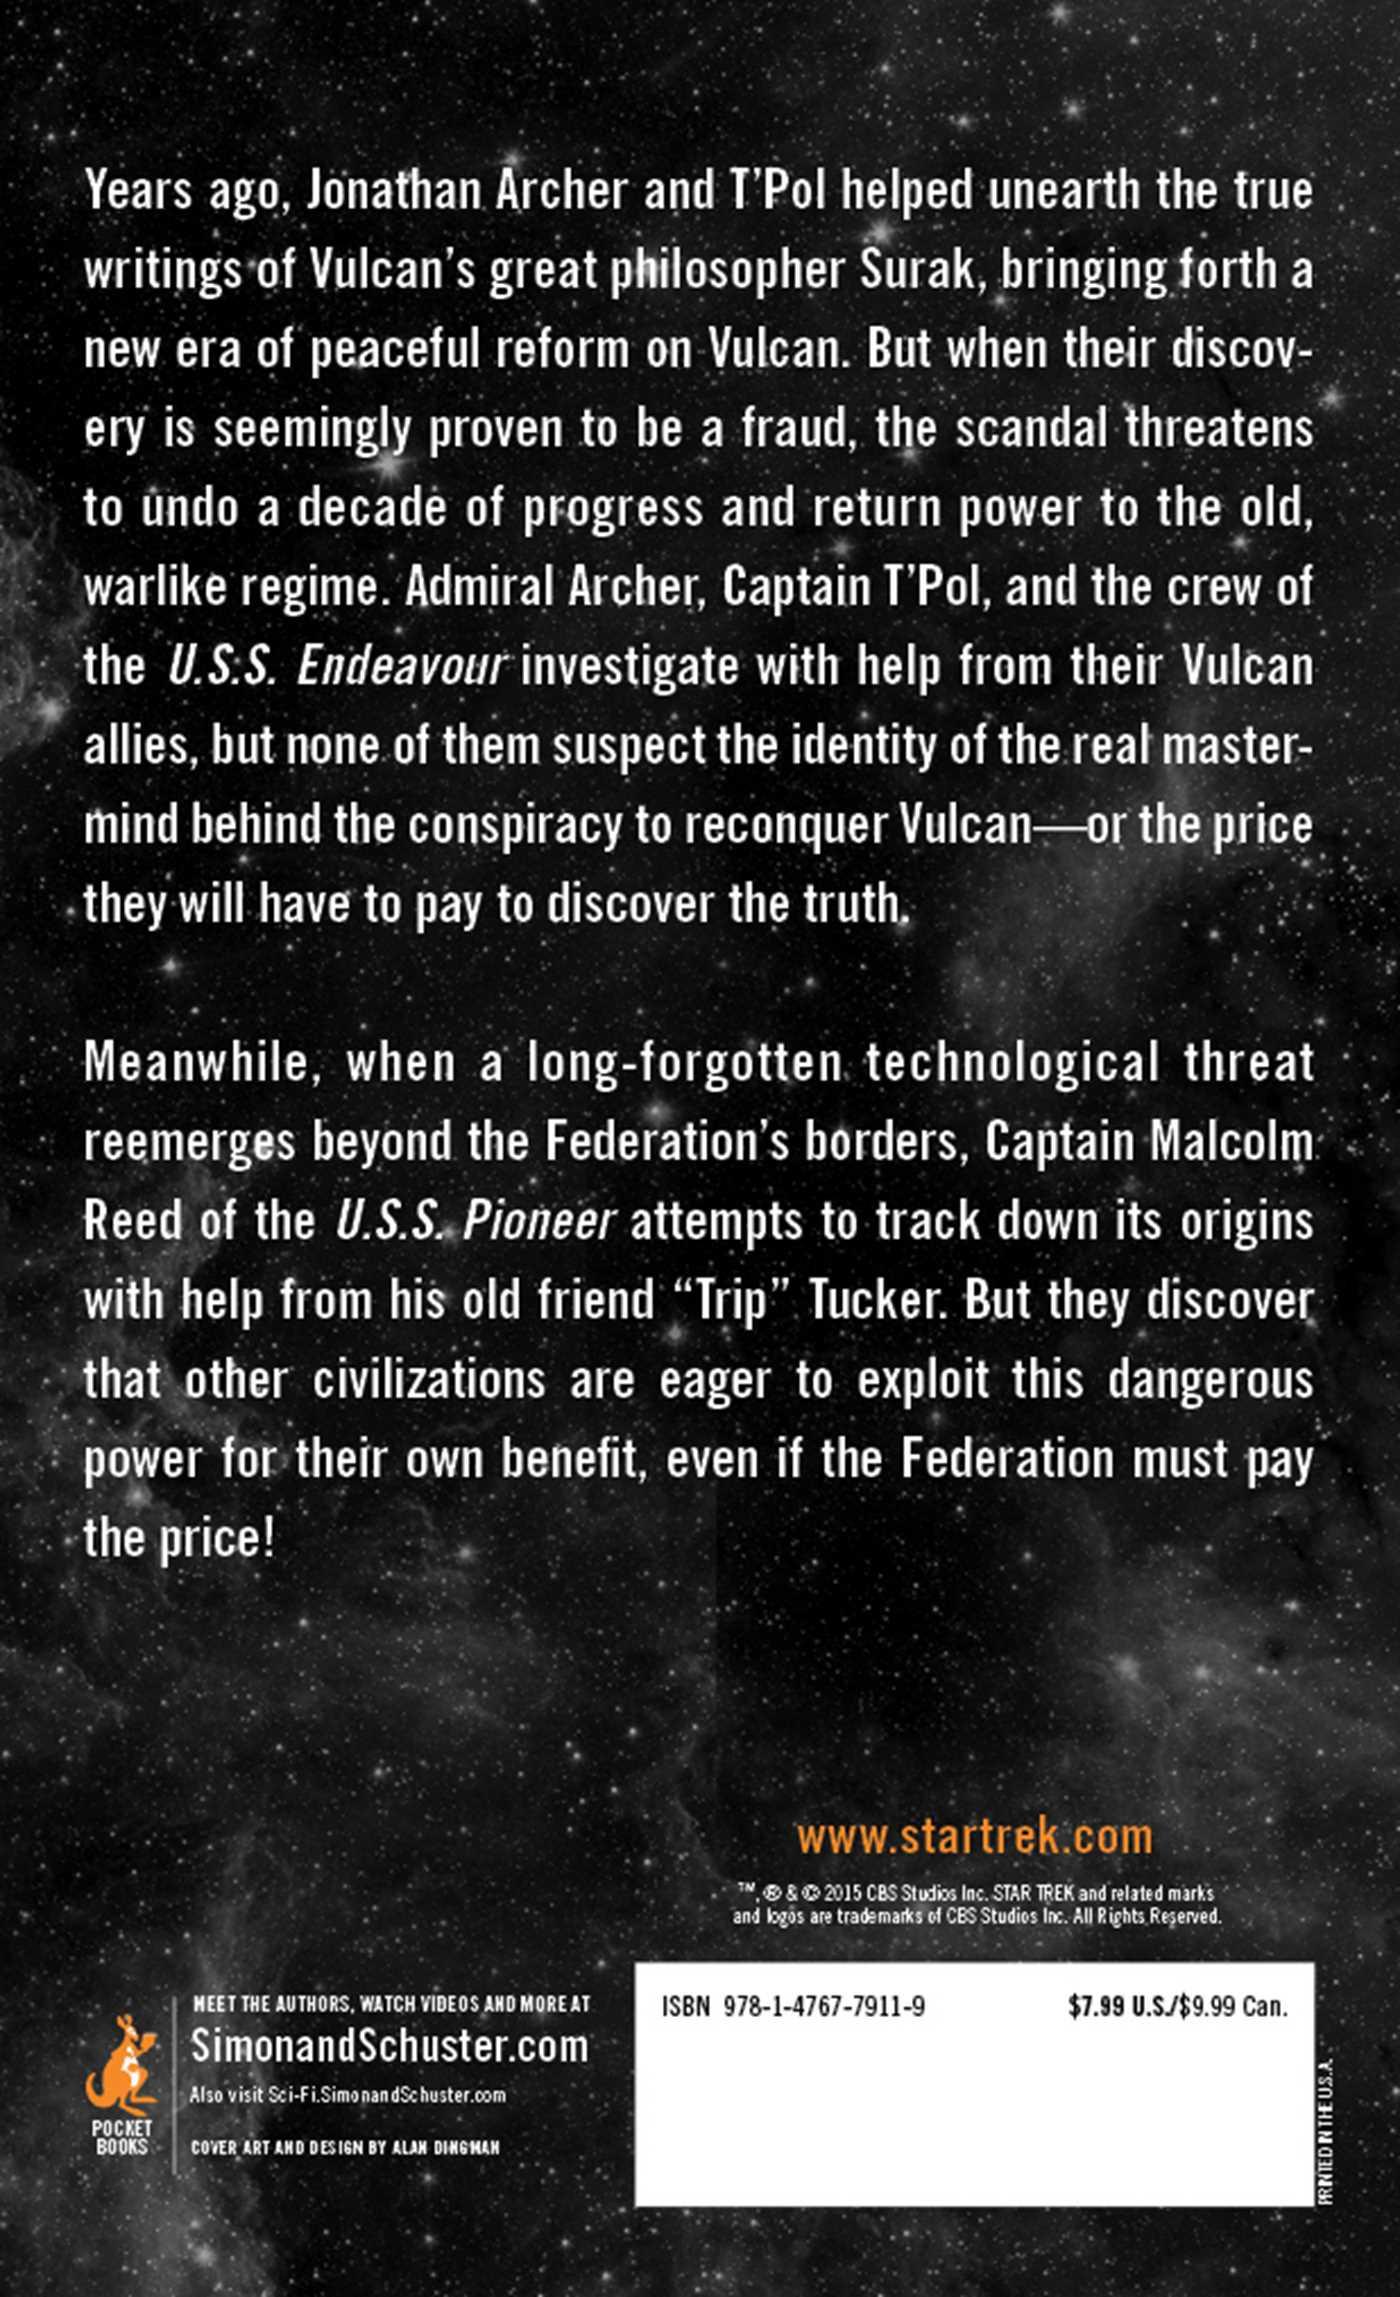 Star trek enterprise rise of the federation 9781476779119 hr back